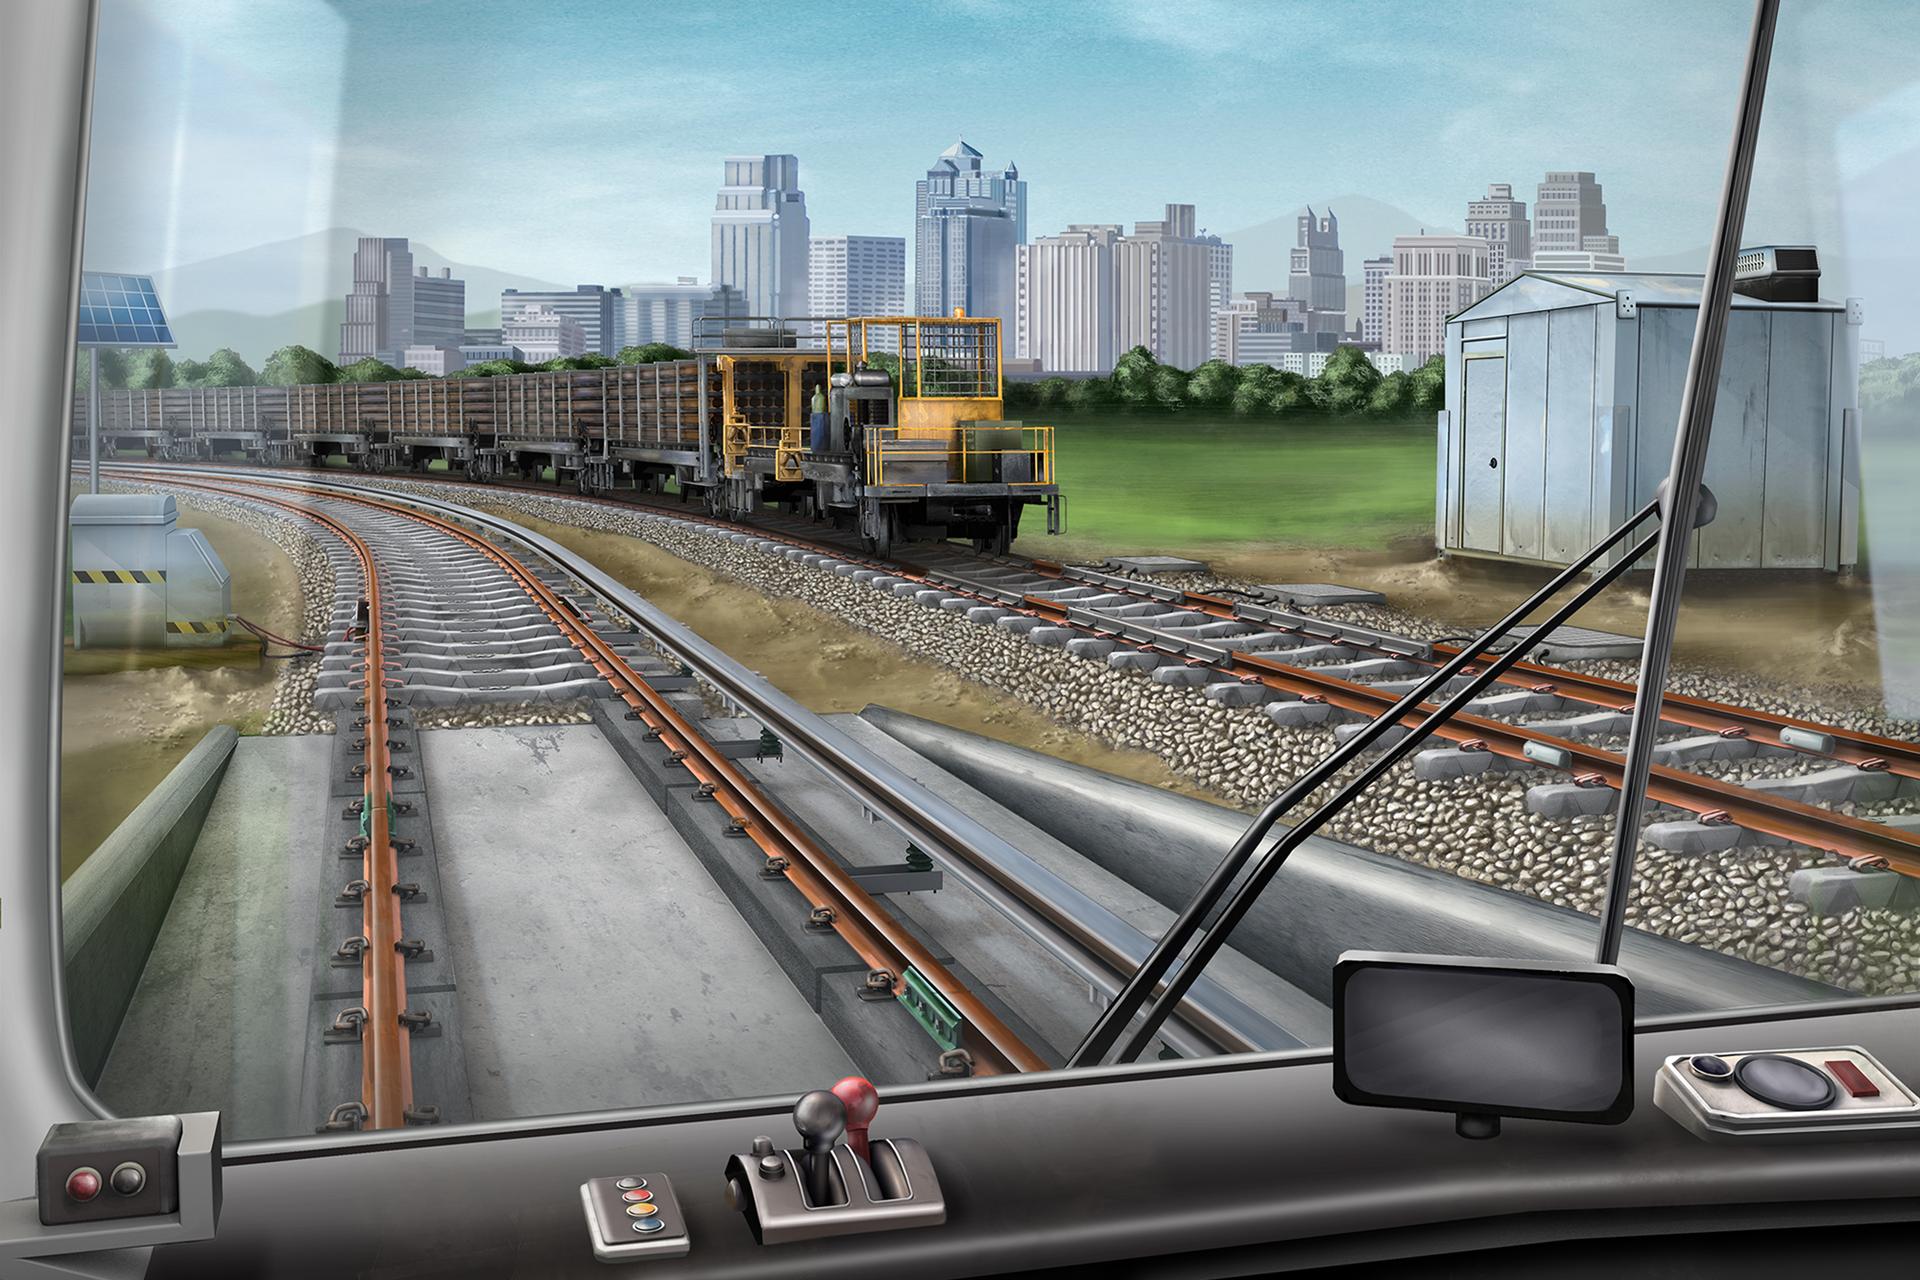 Railroad Material Supplier, Railroad Illustration, Ninetimes, Railroad Scene, Rail, Insulated Rail Joint, Track, Concrete Ties, CWR, Work Train